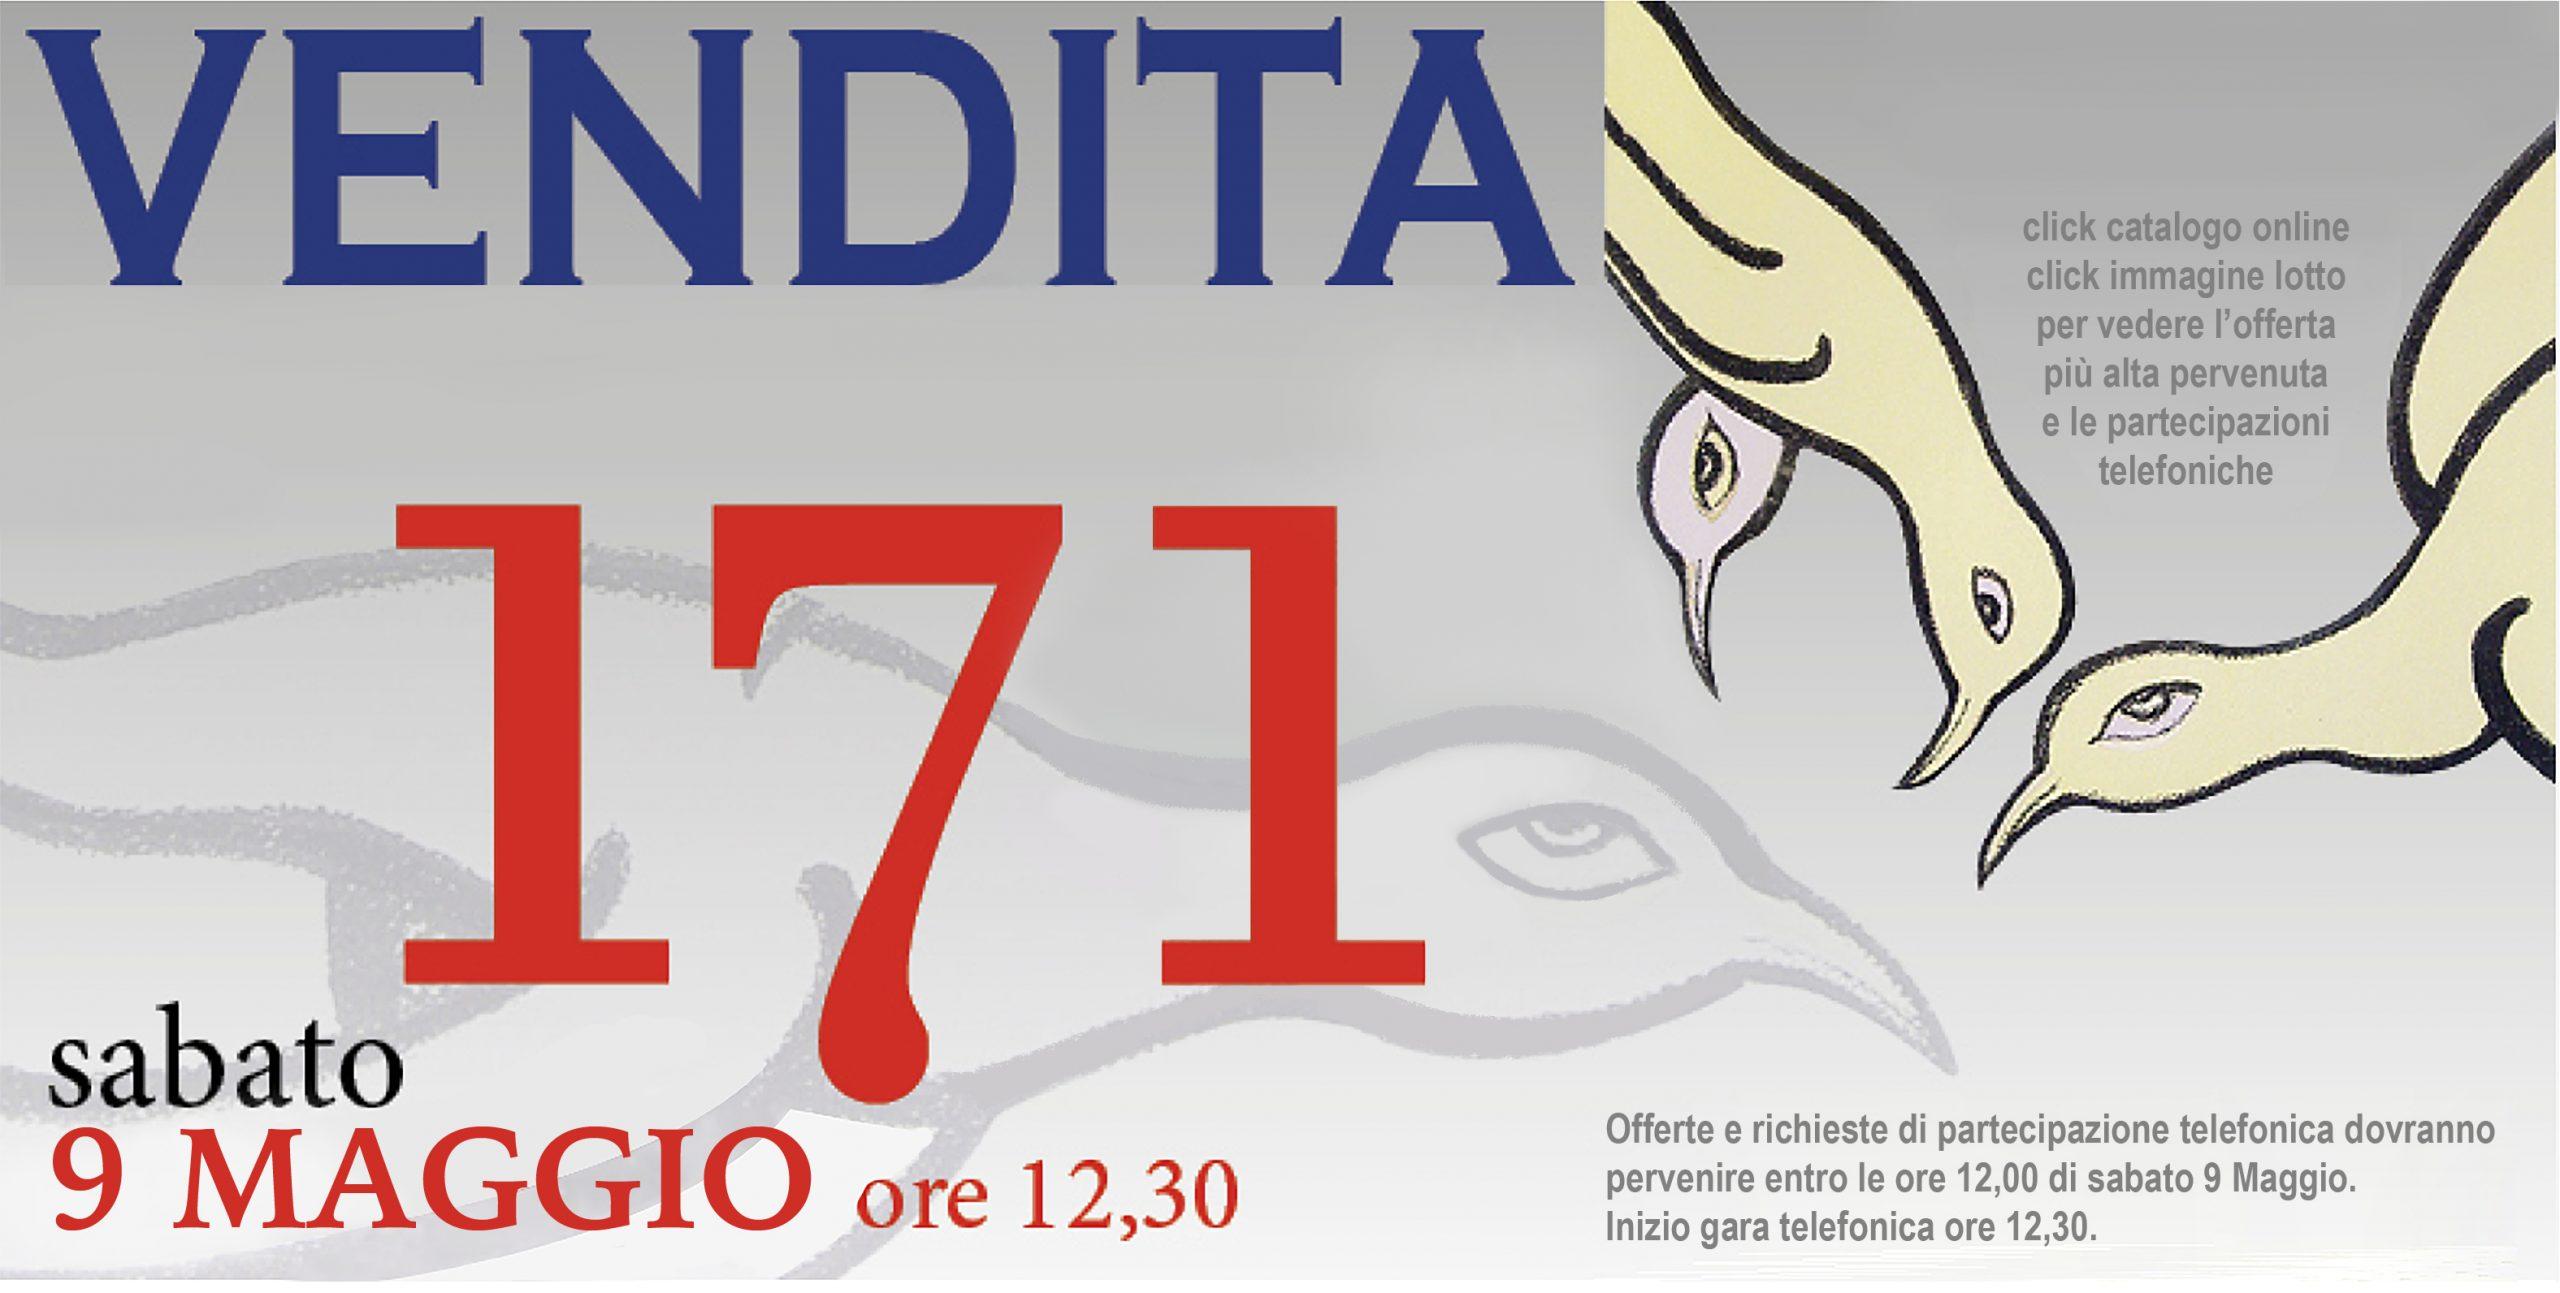 VENDITA 171